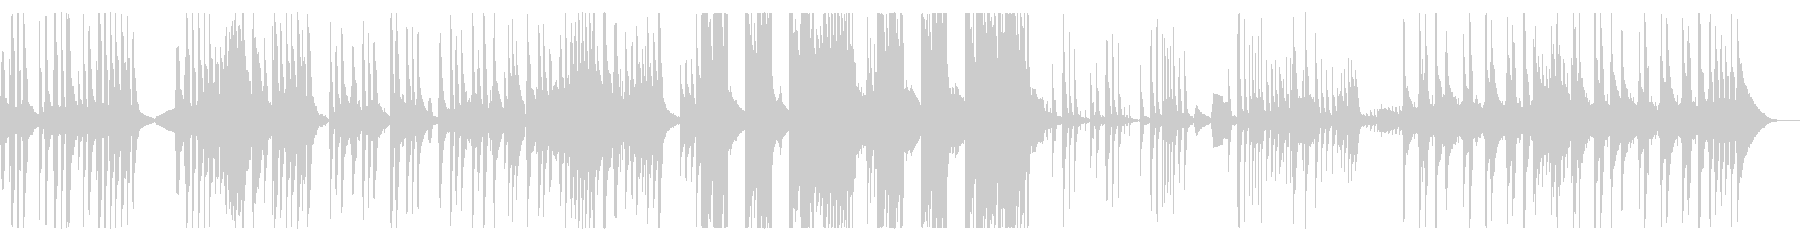 Bone Ukuleleの未再生の波形